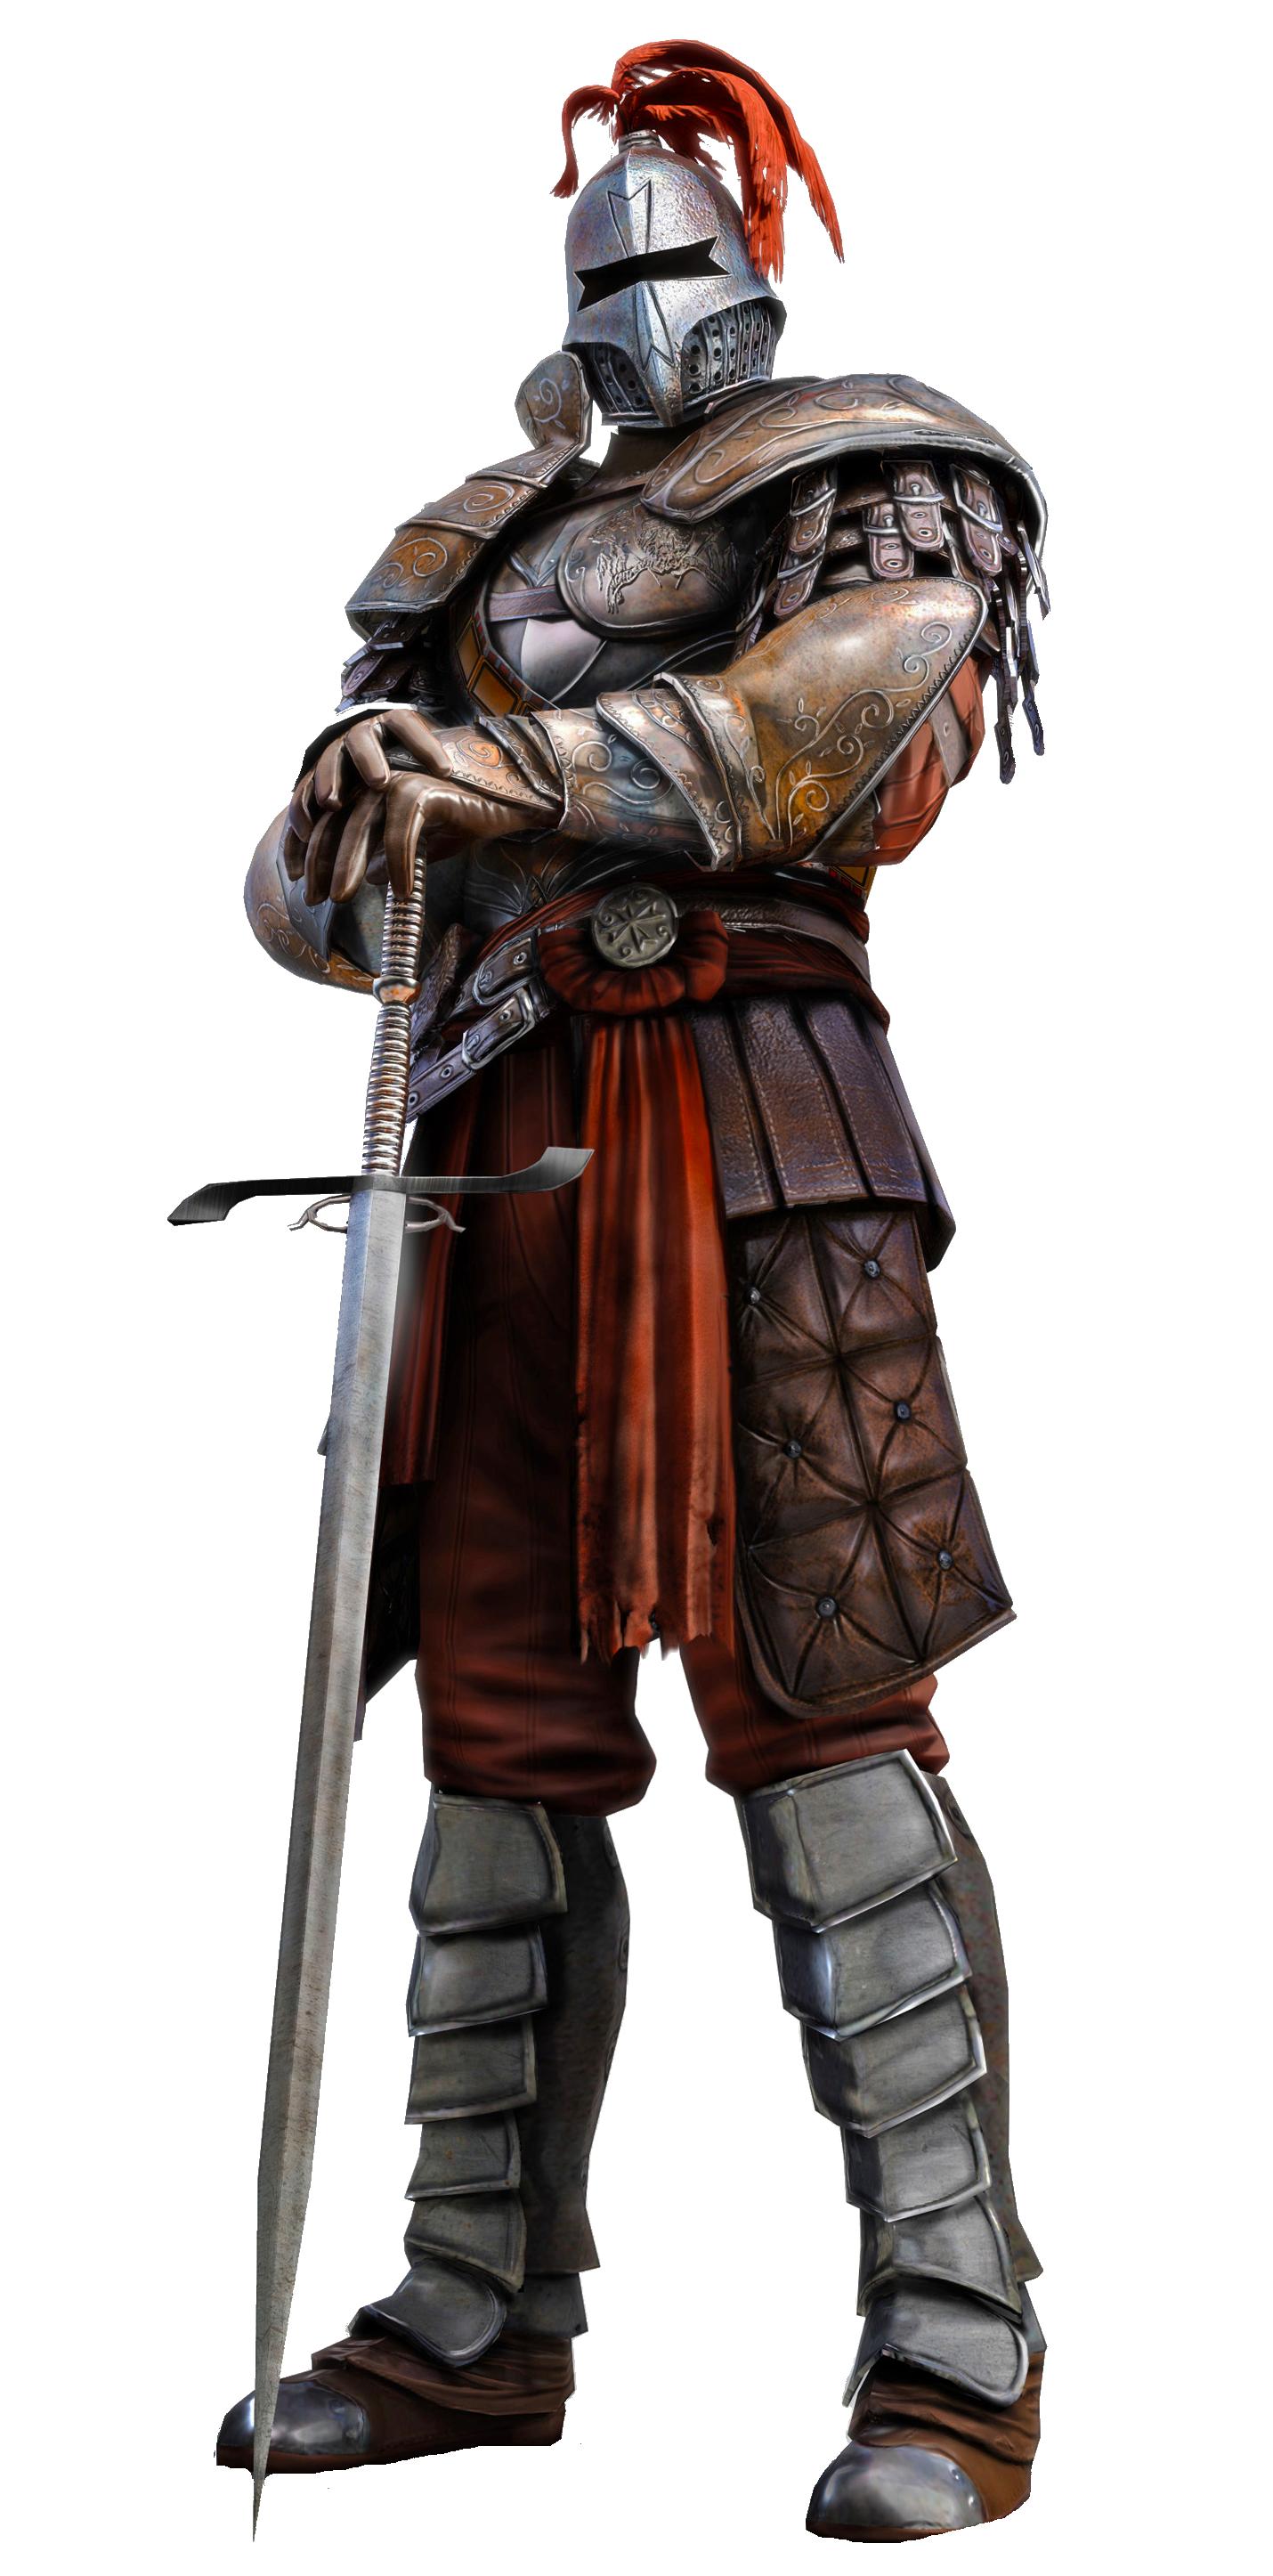 Medival illustration png image. Knight clipart face knight